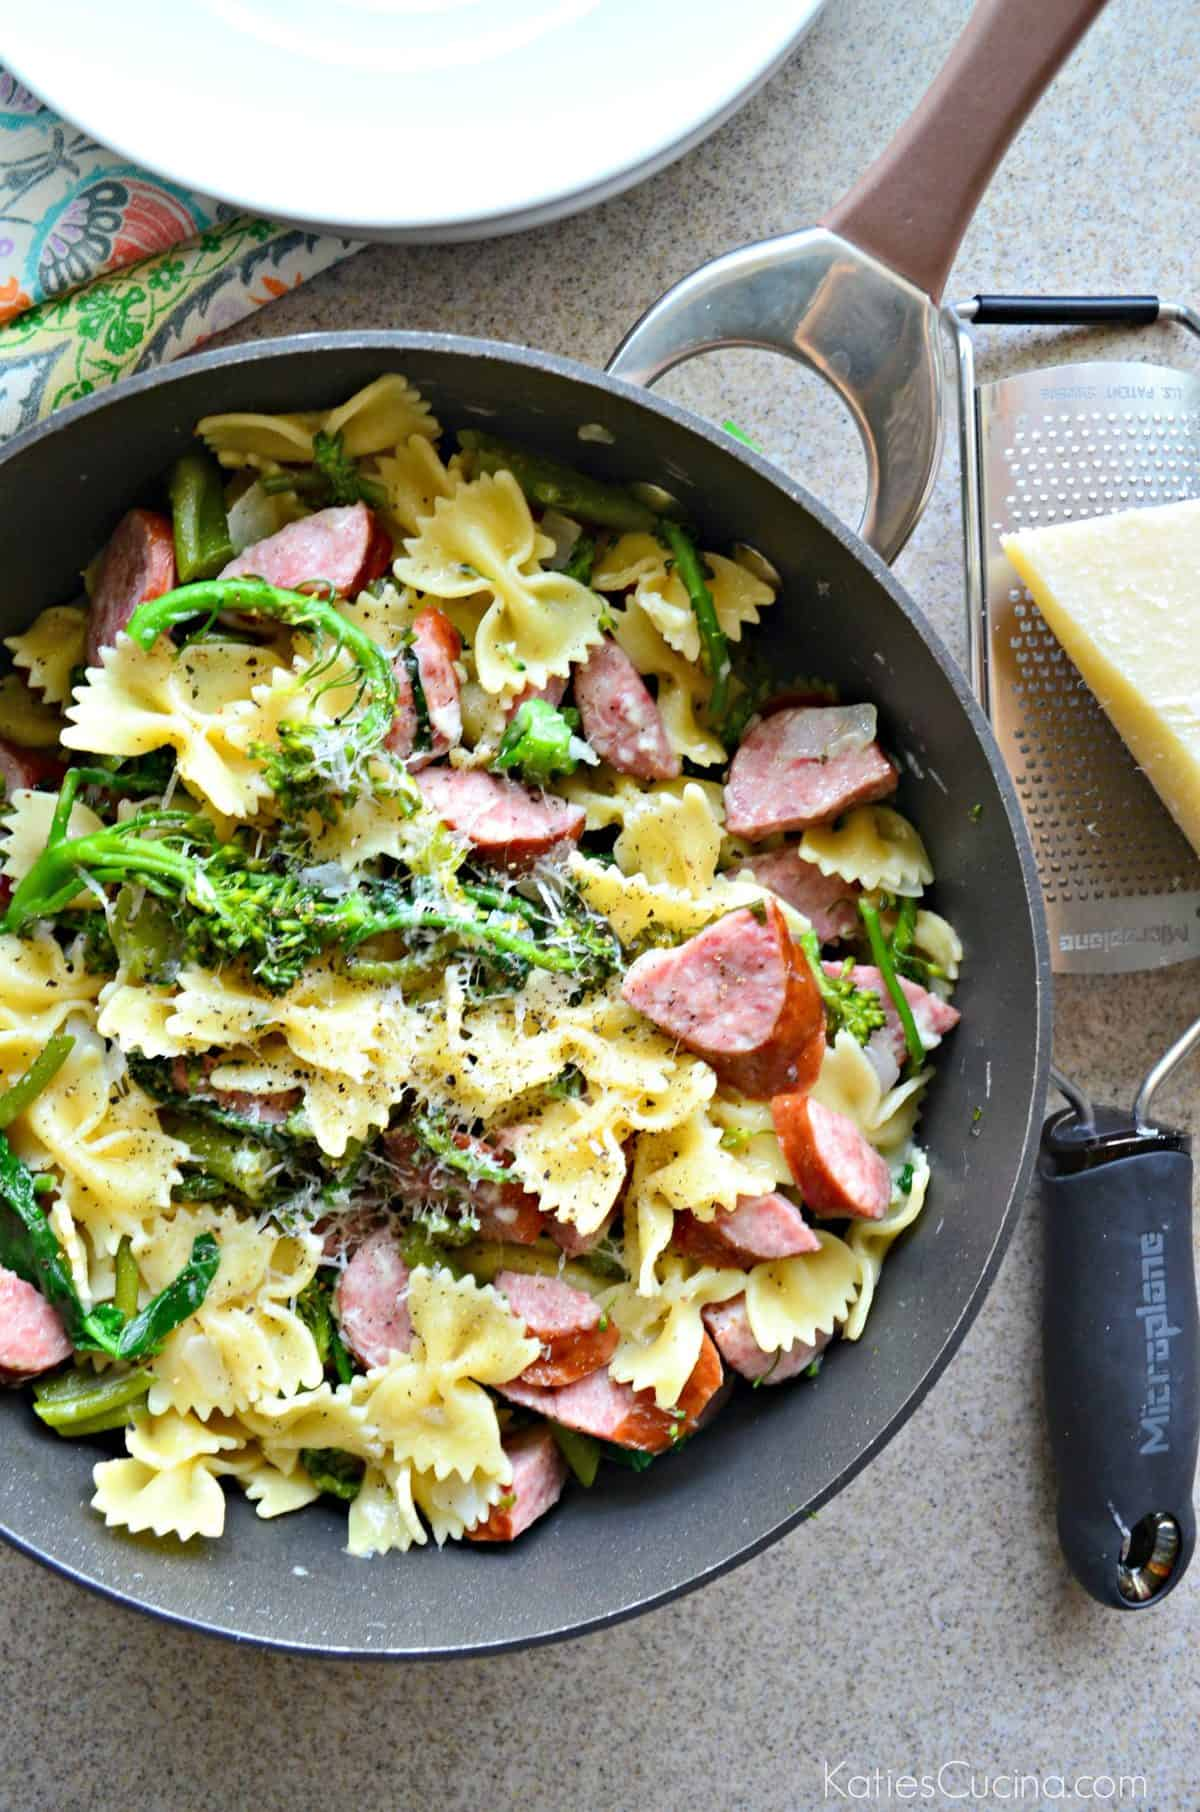 One Pot Kielbasa  Broccoli Pasta  Katies Cucina